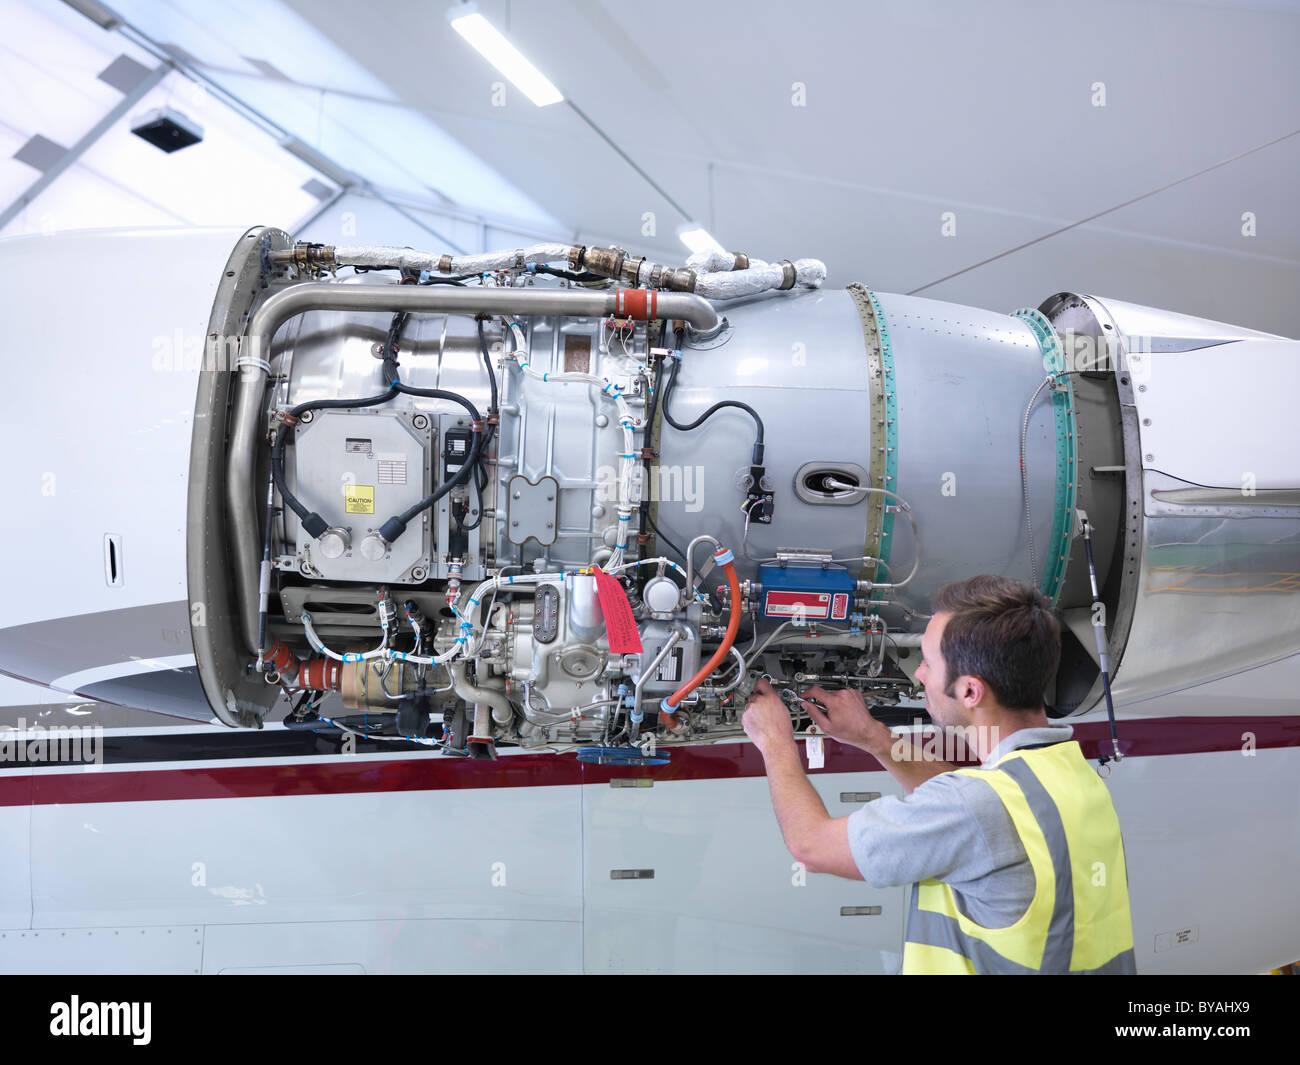 Engineer working on jet engine - Stock Image